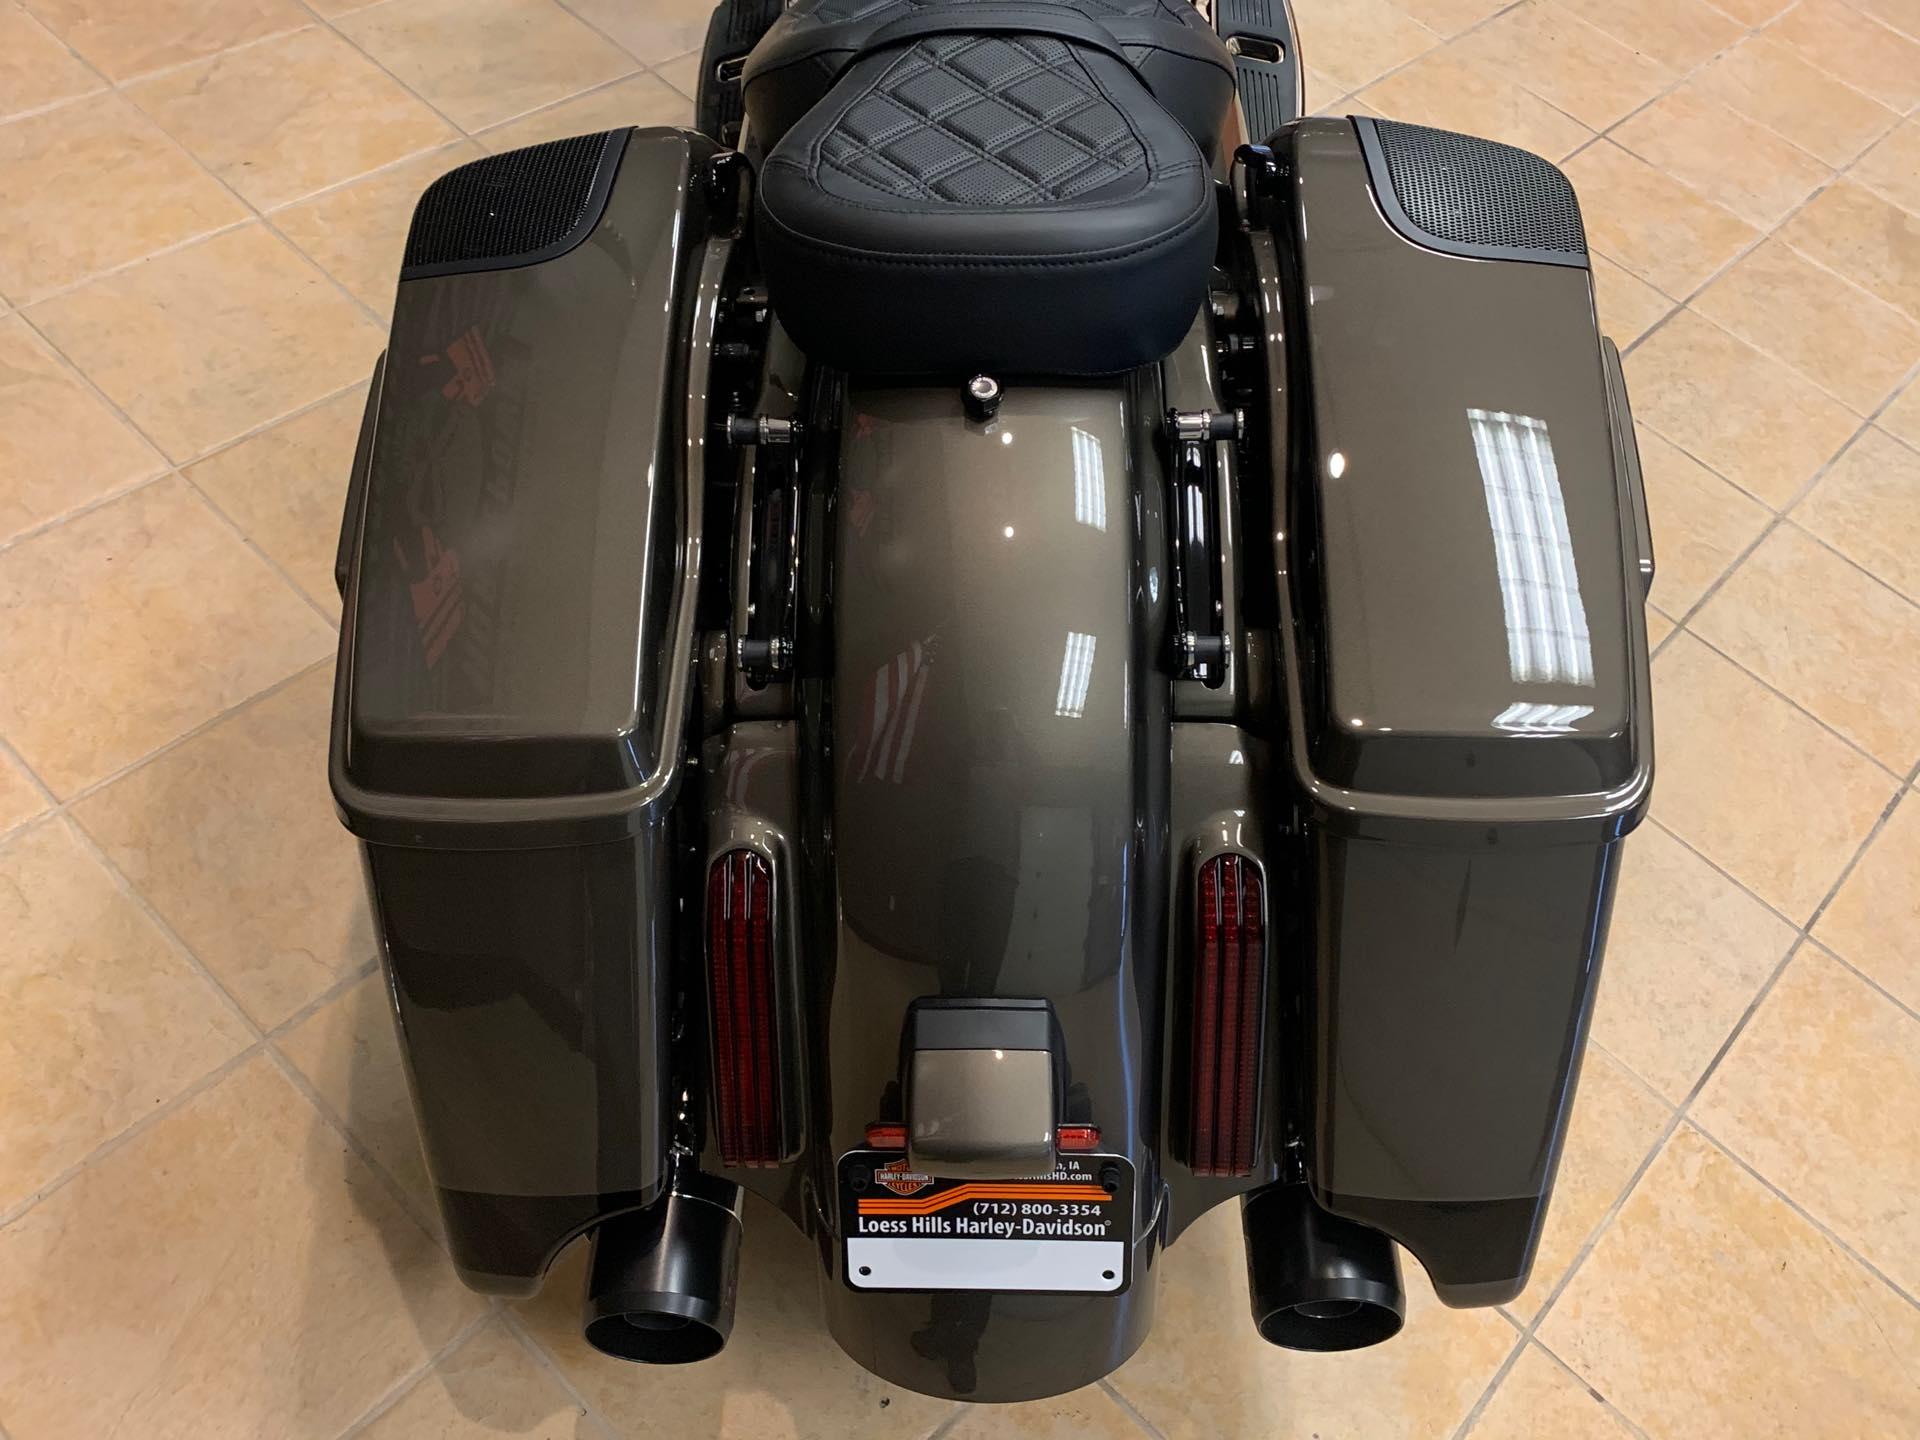 2021 Harley-Davidson Touring CVO Street Glide at Loess Hills Harley-Davidson